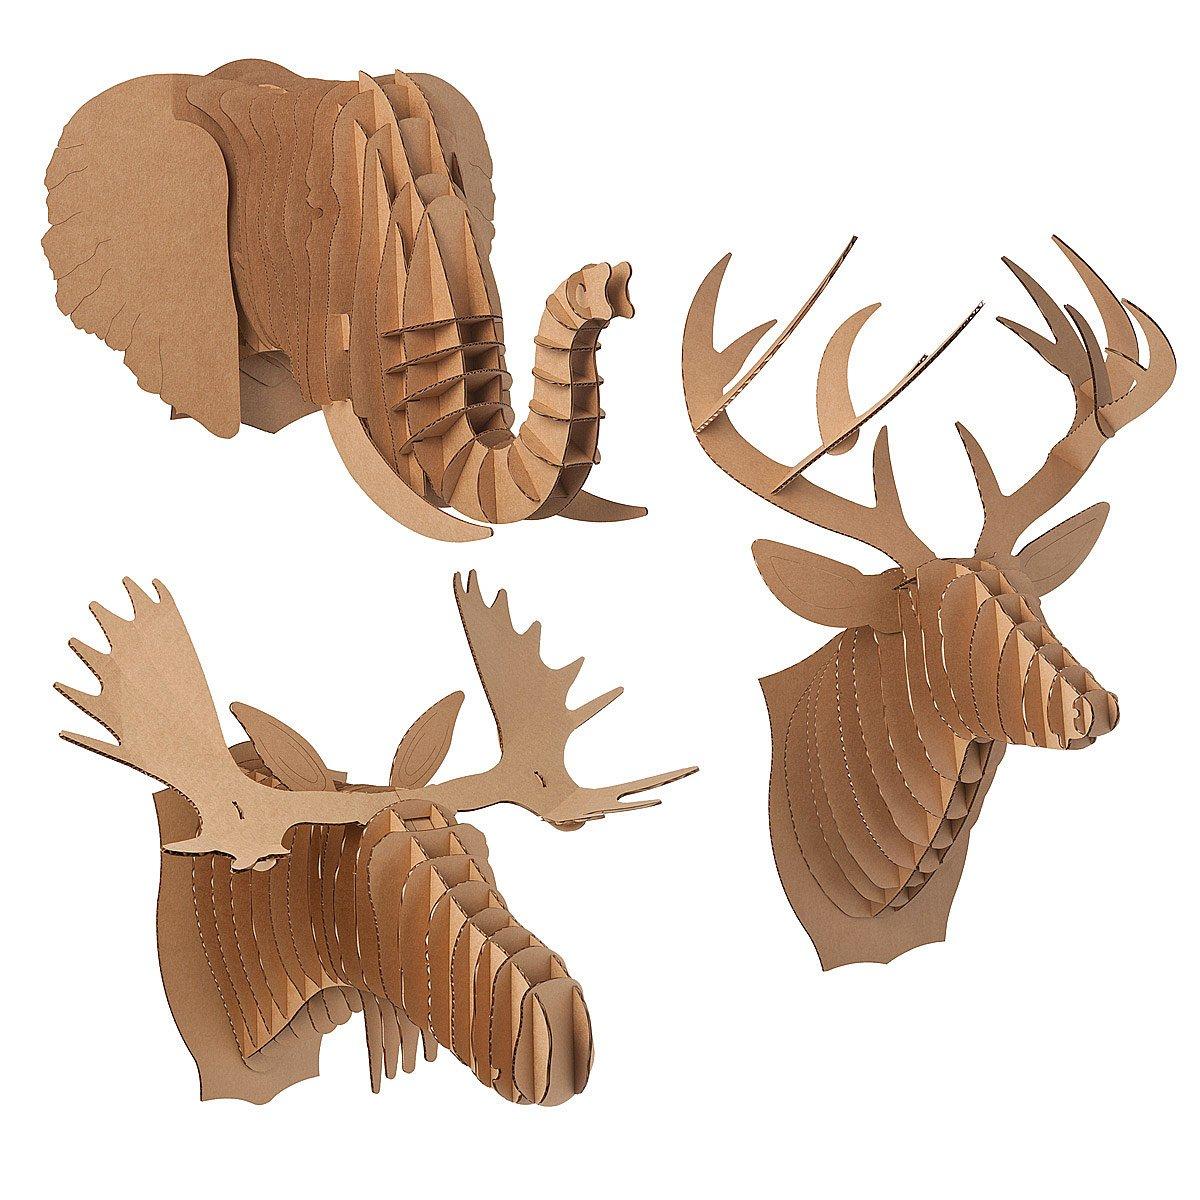 Calmly Cardboard Animal Heads Thumbnail Cardboard Animal Heads Paper Elephant Uncommongoods Cardboard Deer Head Template Cardboard Deer Head Typo houzz-02 Cardboard Deer Head